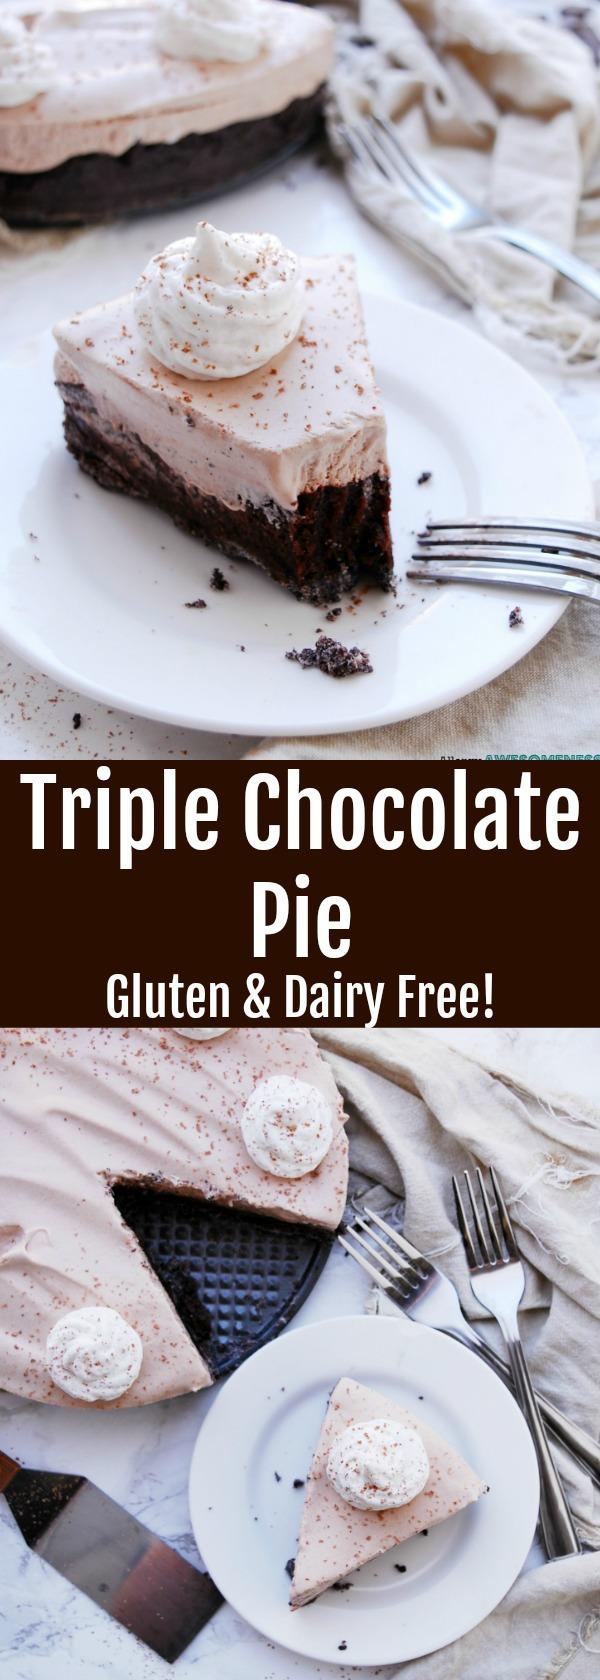 Triple Chocolate Pie (Gluten & dairy-free) Recipe by AllergyAwesomeness.com